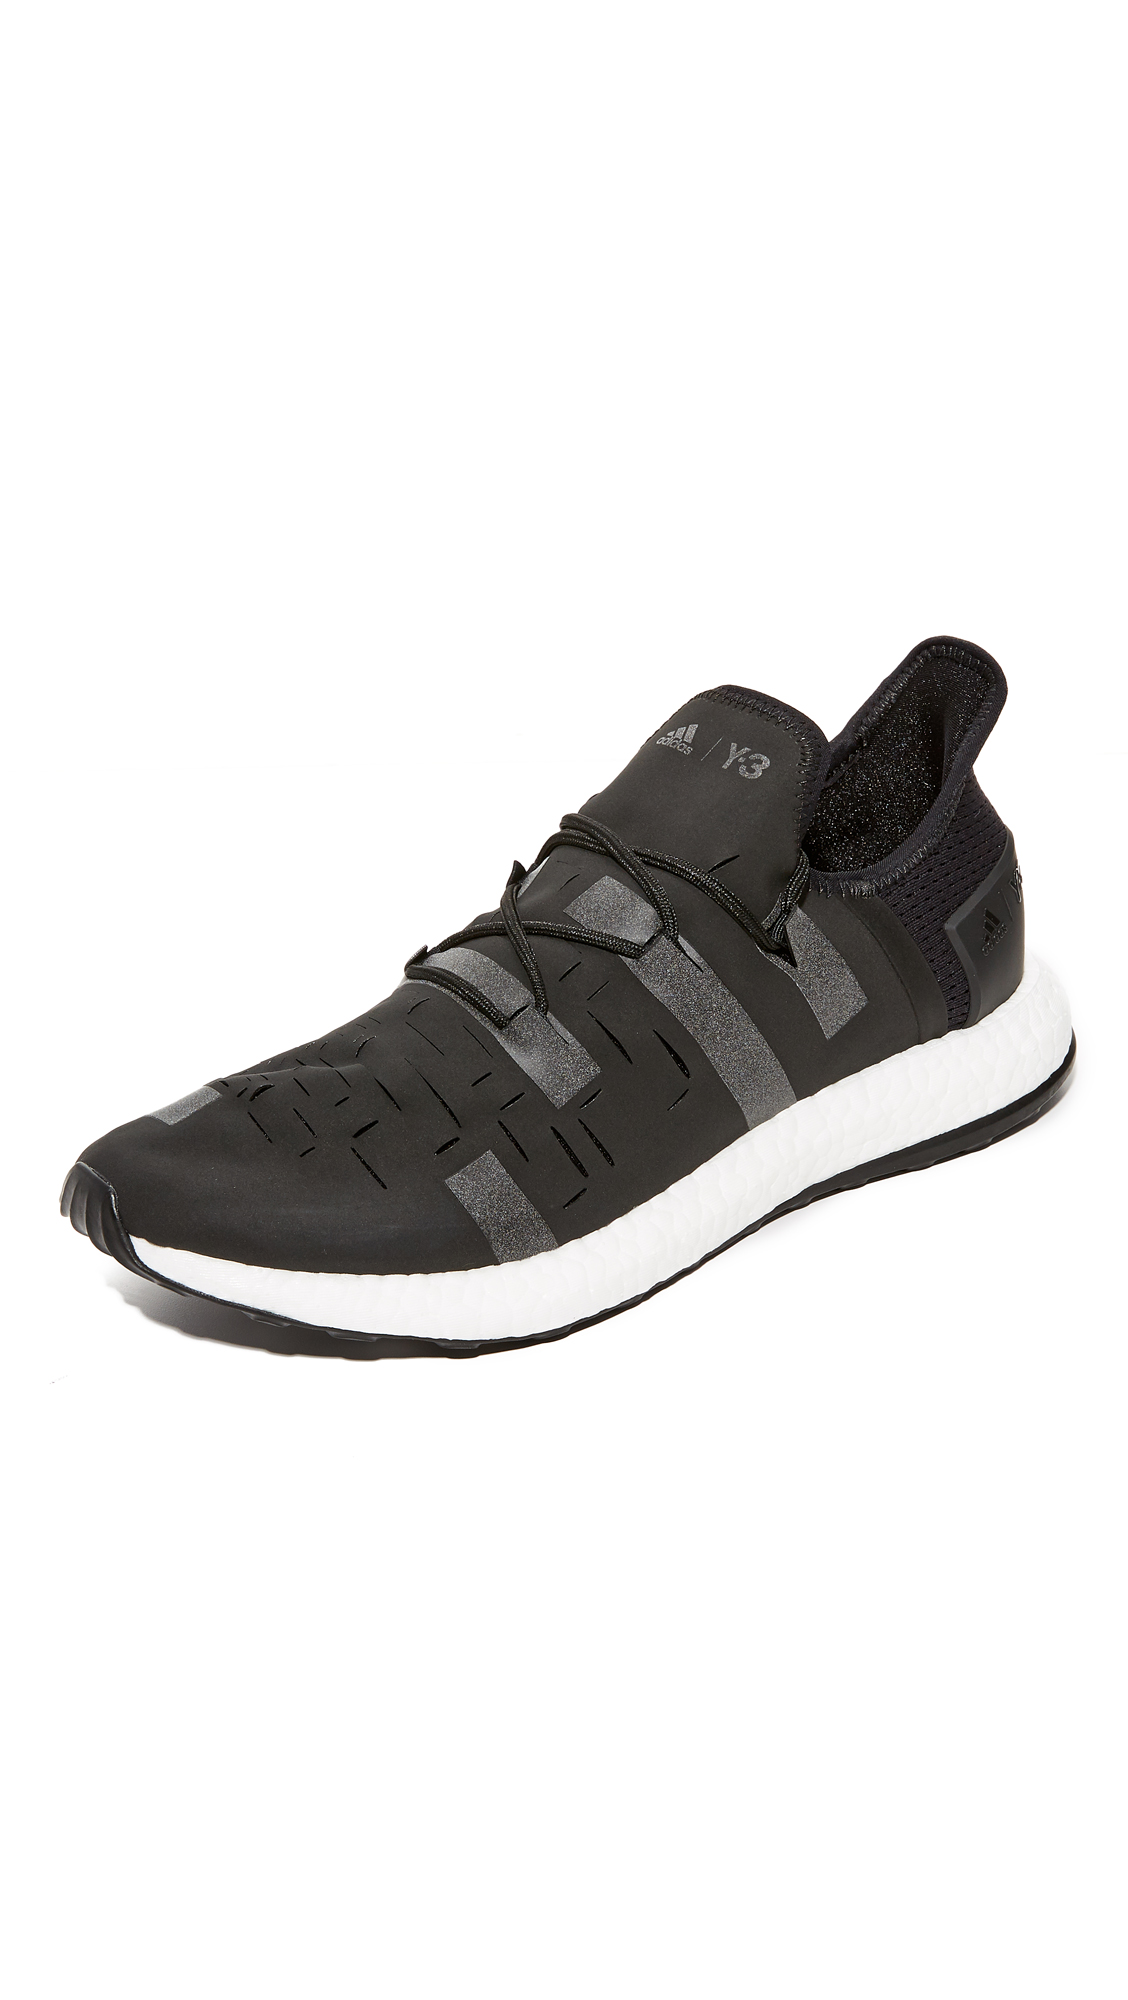 Y-3 Black Approach Low Sneakers